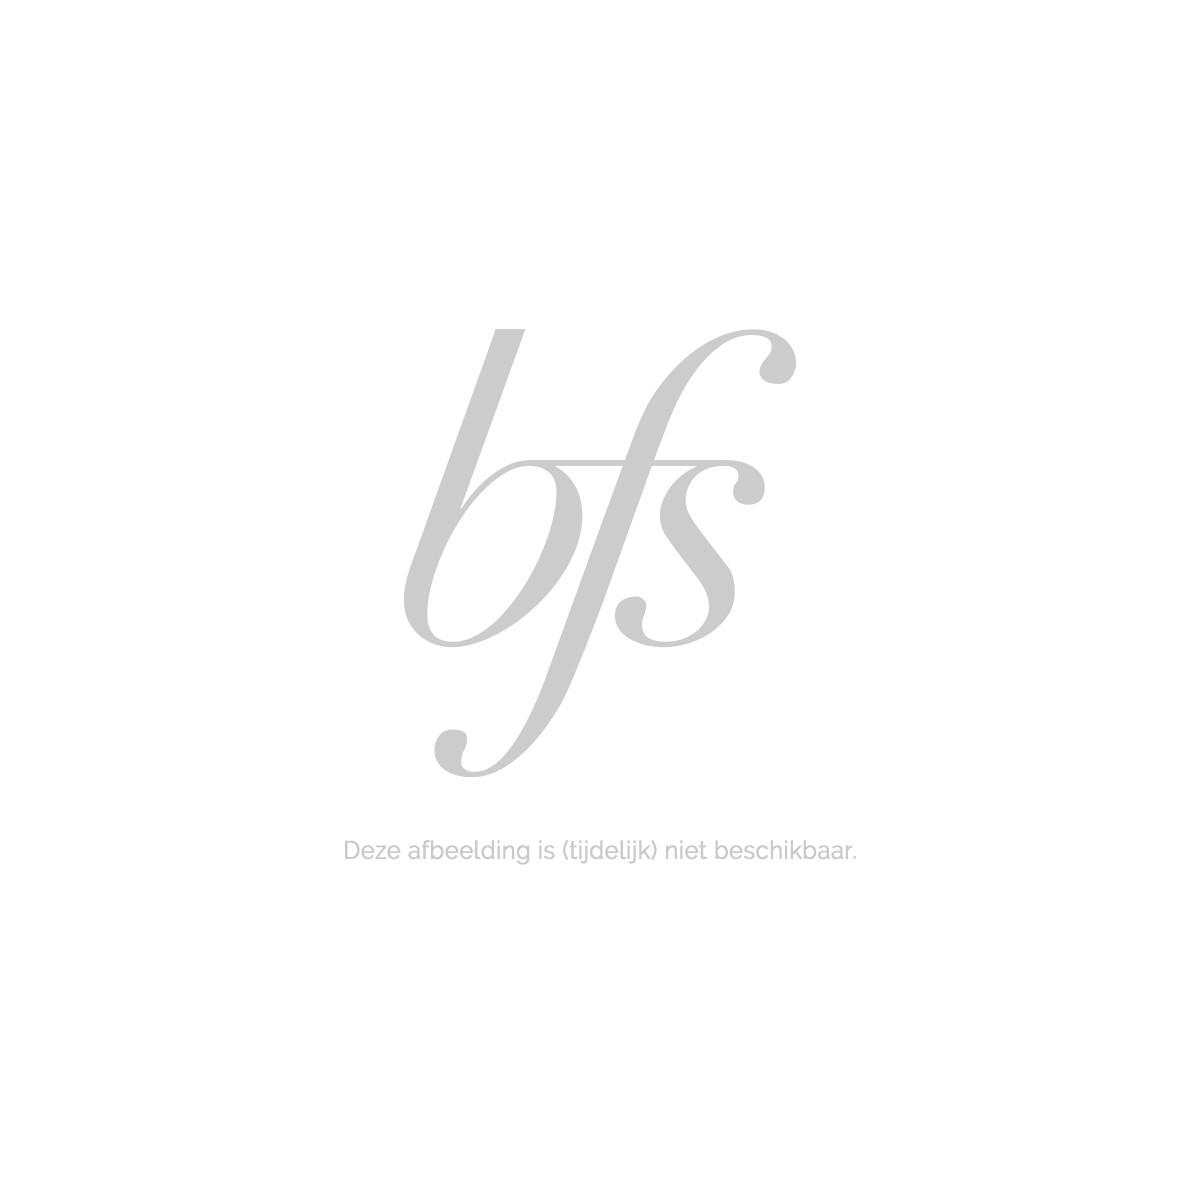 Dr. Tadlea Cosmetica Biobalance 24 Hours Firming Cream 75 Ml